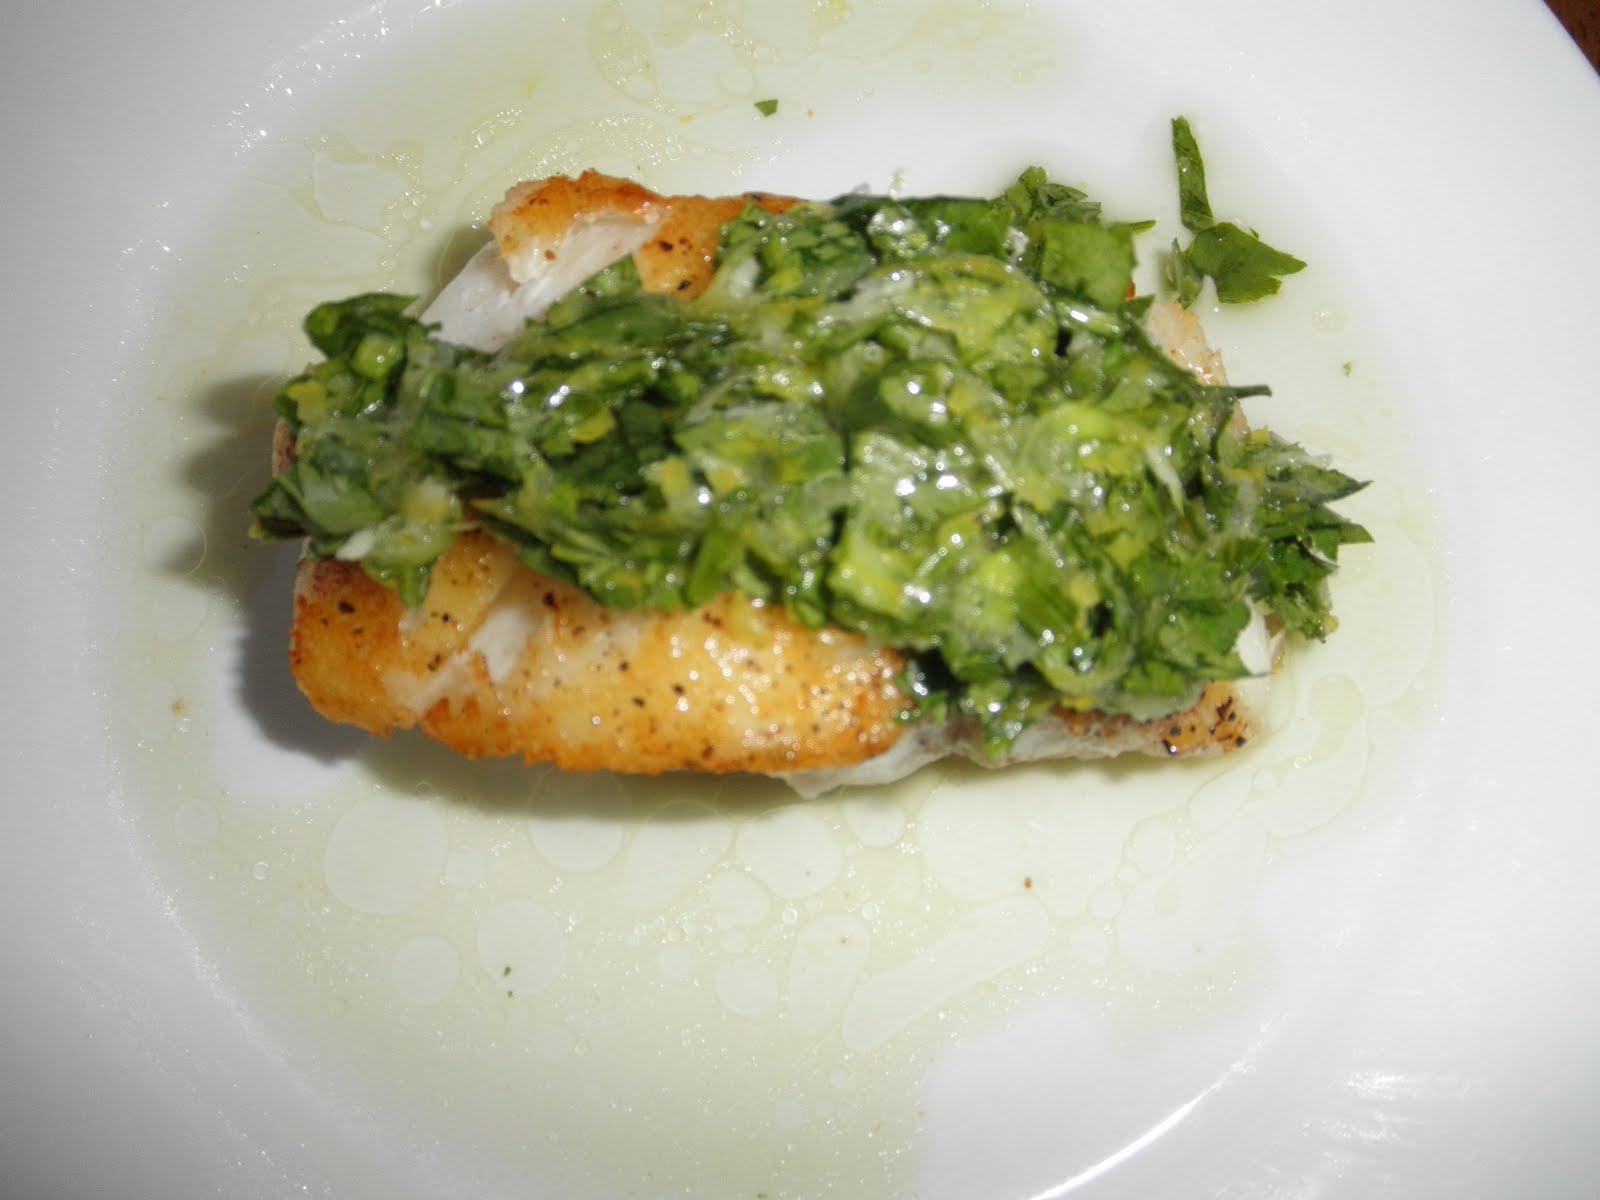 Lex 39 s life pan seared pacific cod with cilantro vinaigrette for Is cod fish kosher